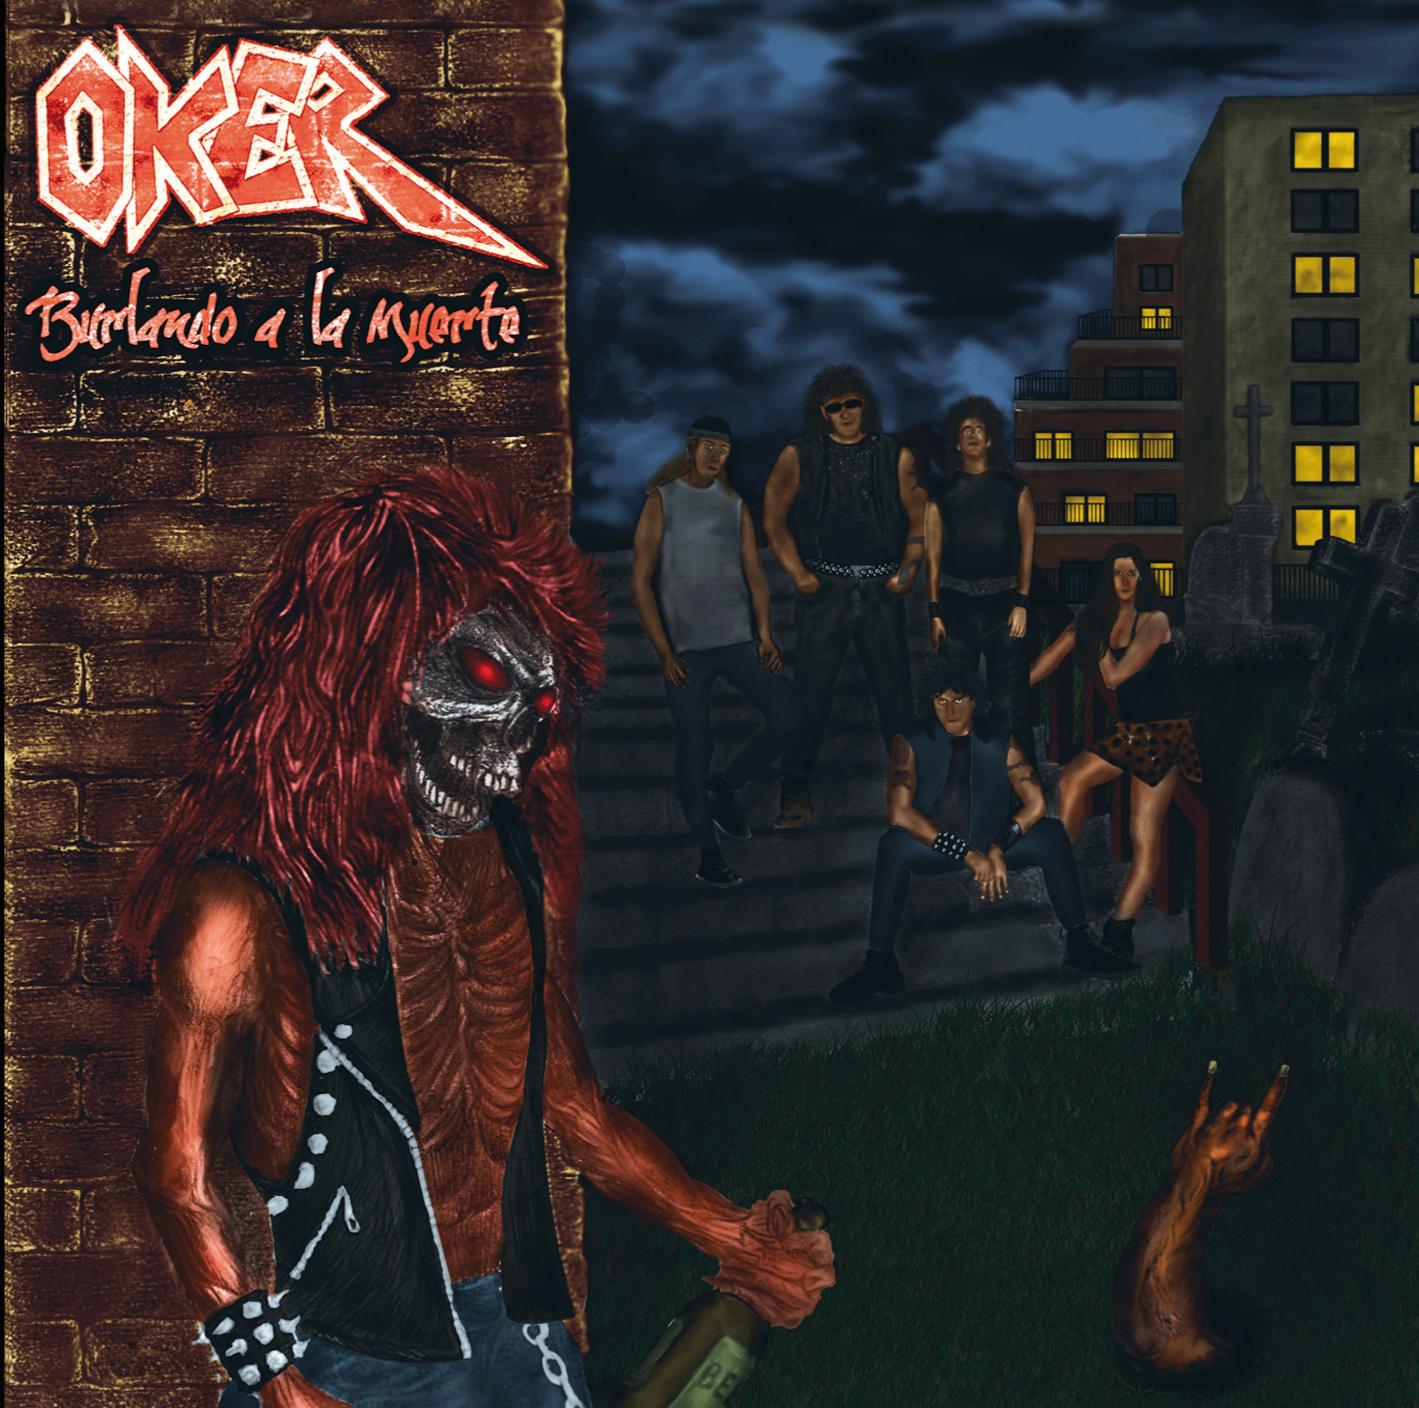 Oker - Dale Caña